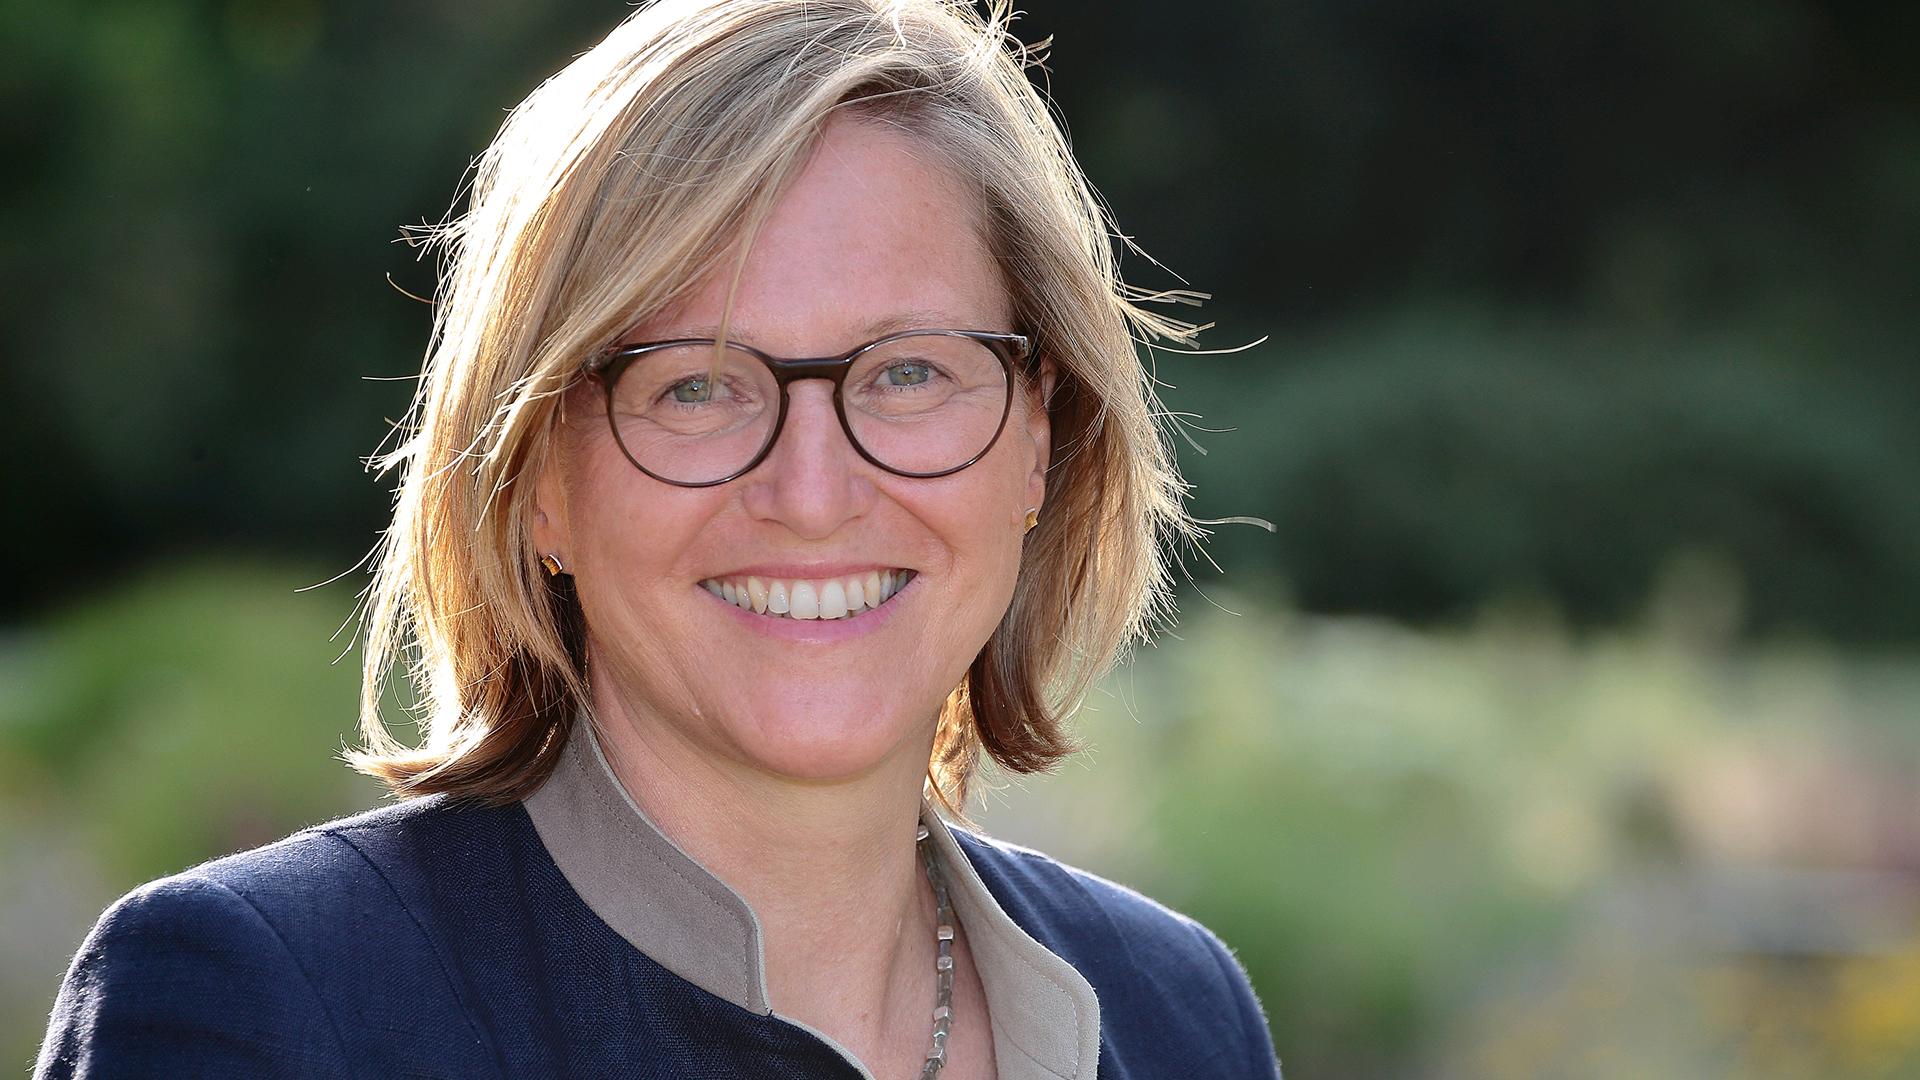 Bürgermeisterin Dr. Sabine Michalek möchte die gesamte Stadtgesellschaft partizipativ am Digitalprozess beteiligen. Foto: privat